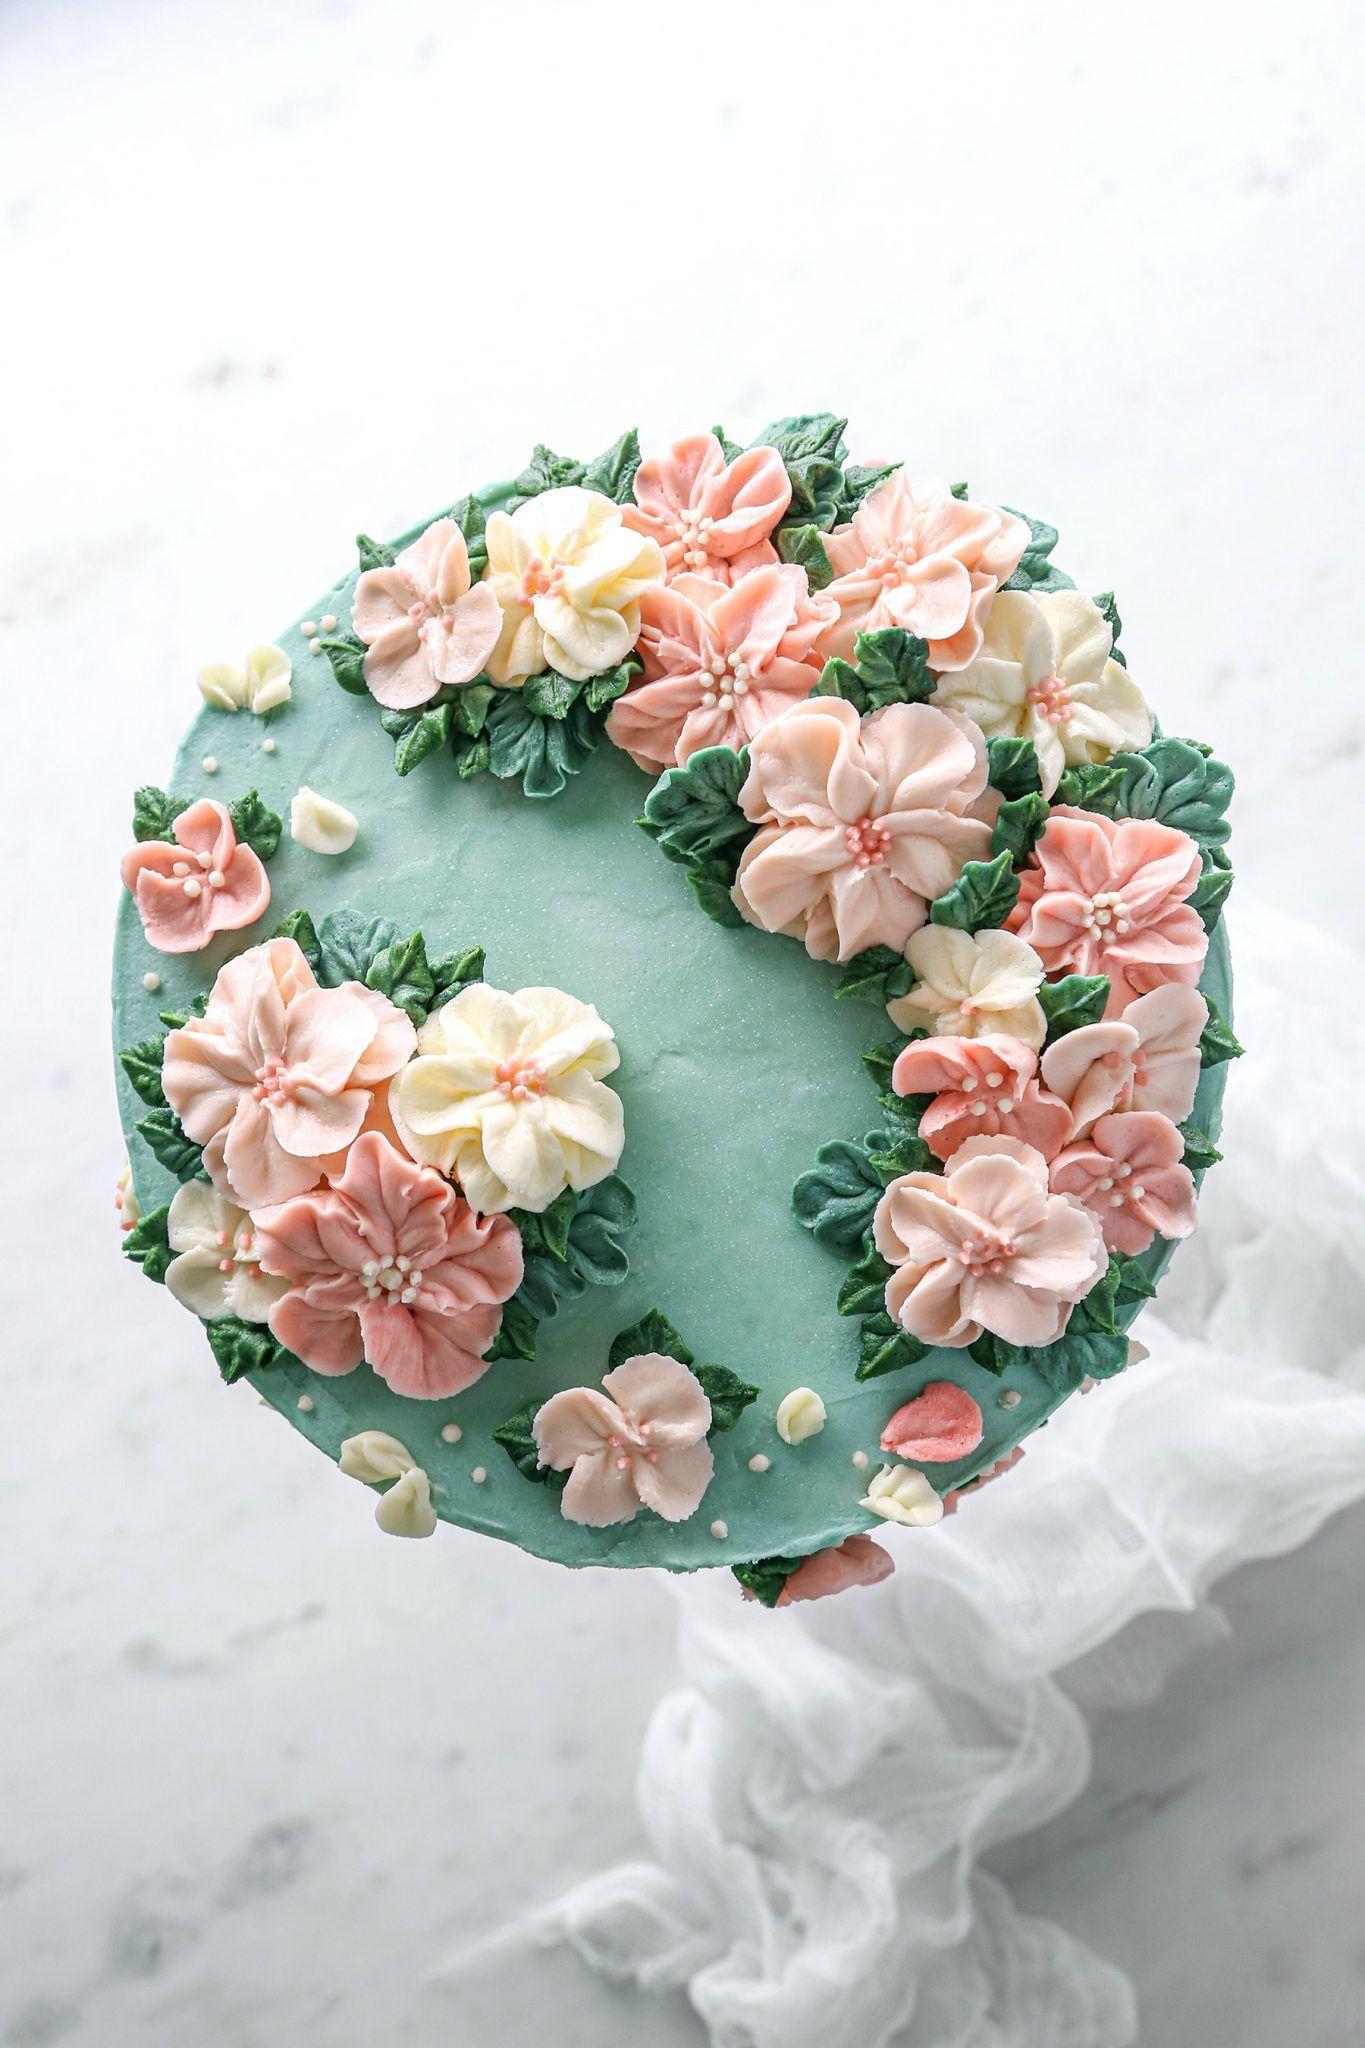 Layered Vanilla Cake With Buttercream Flowers